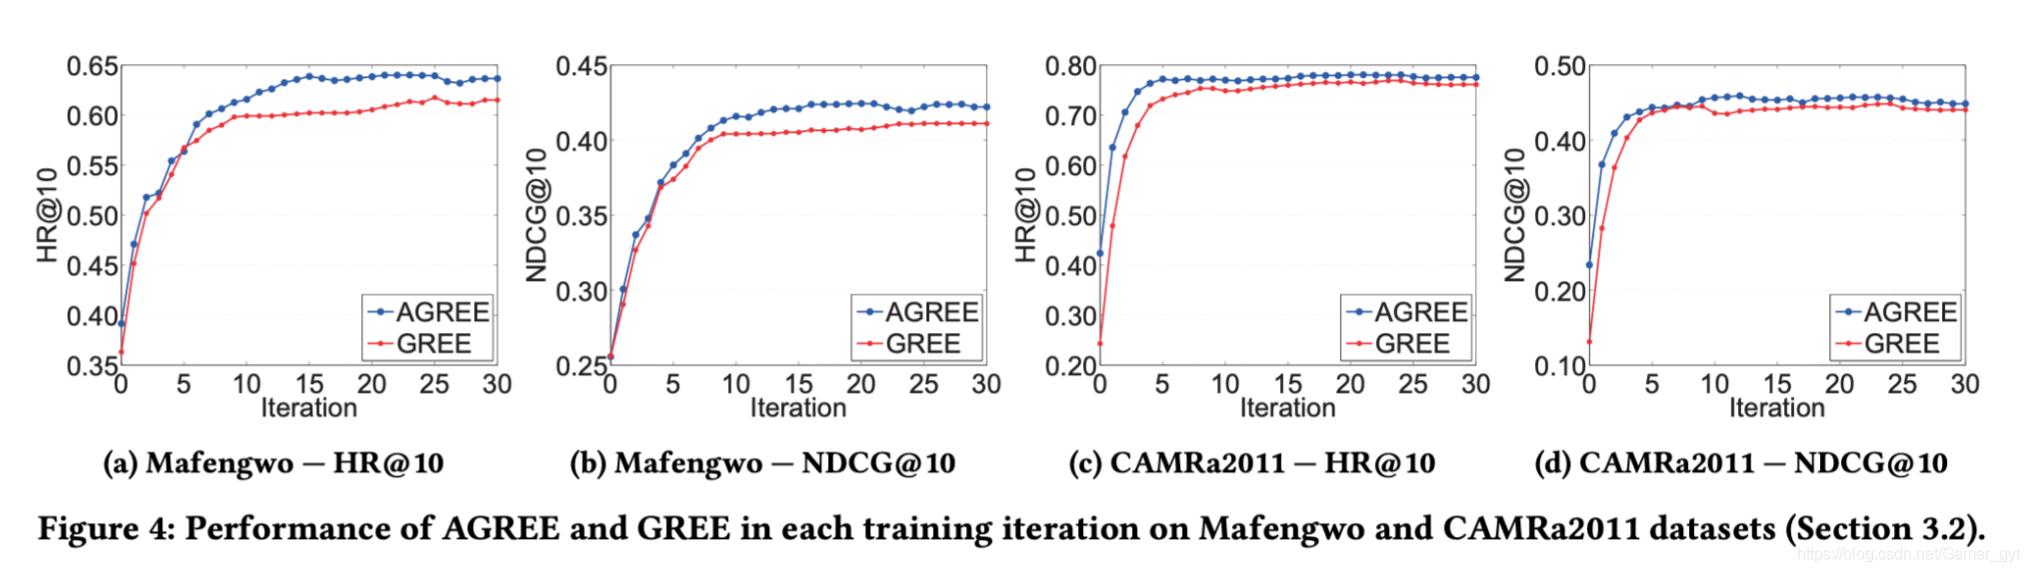 AGREE和GREE的实验效果对比